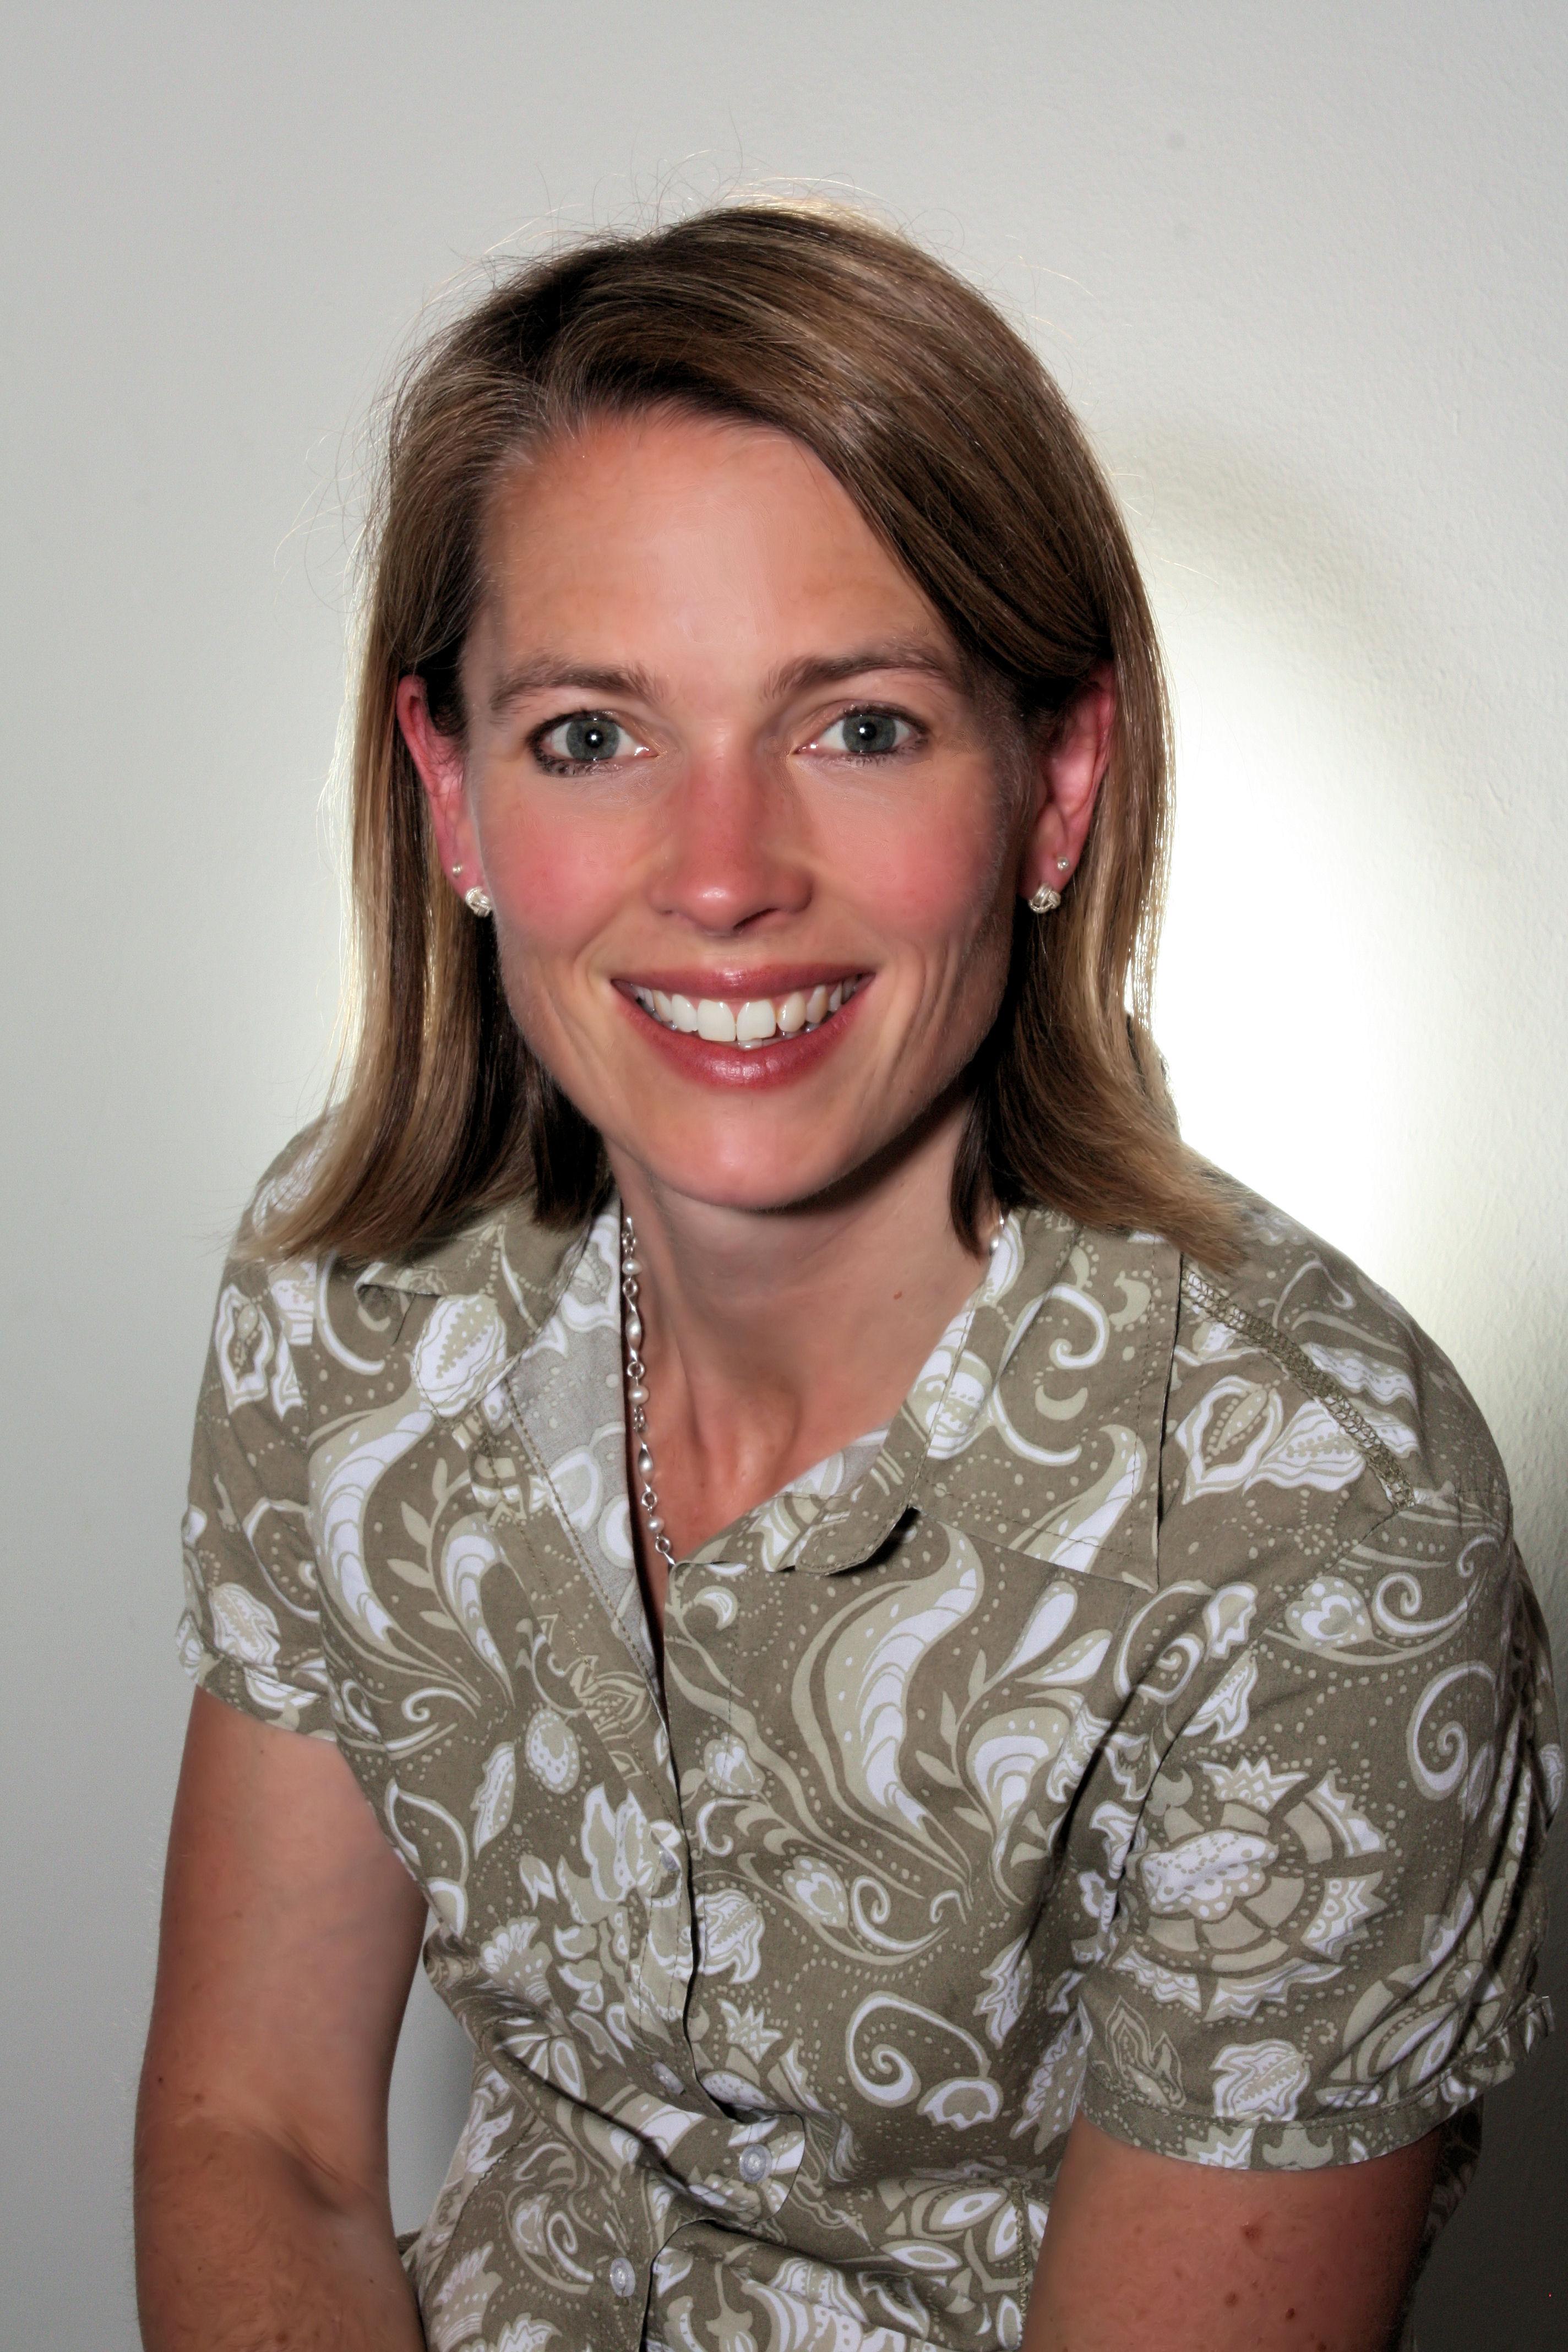 Nicole Hilebrand